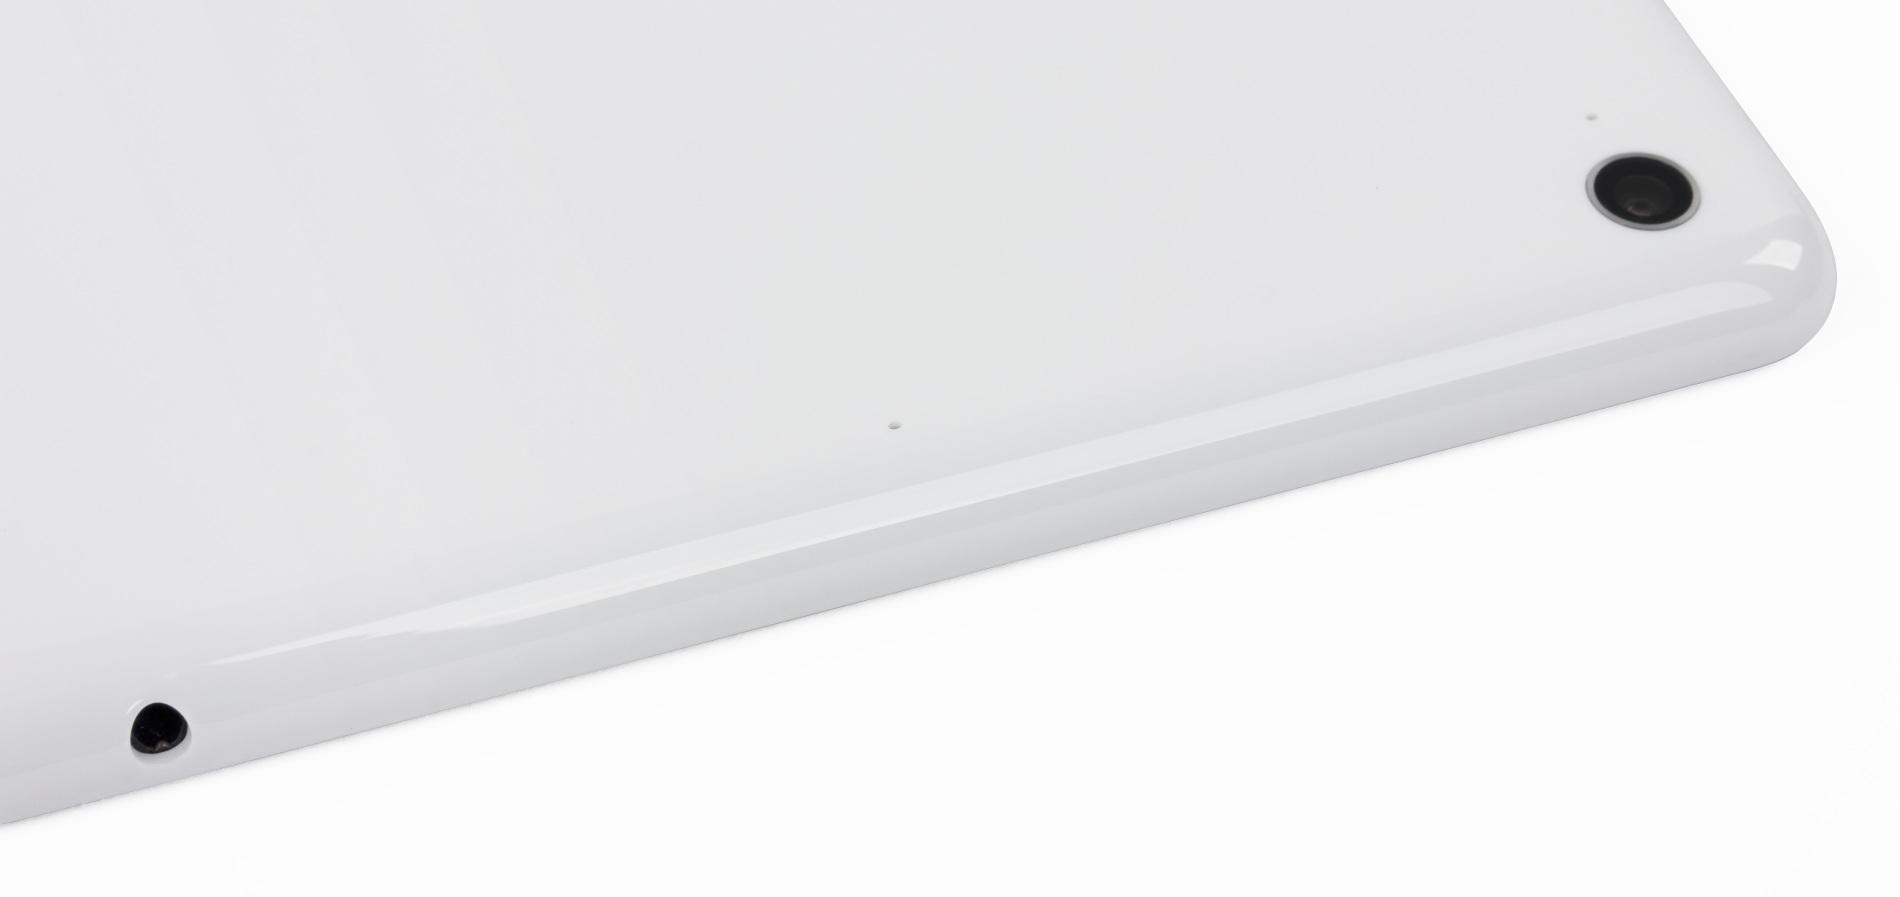 Xiaomi Mi Pad 7,9 16Gb - Верхняя грань